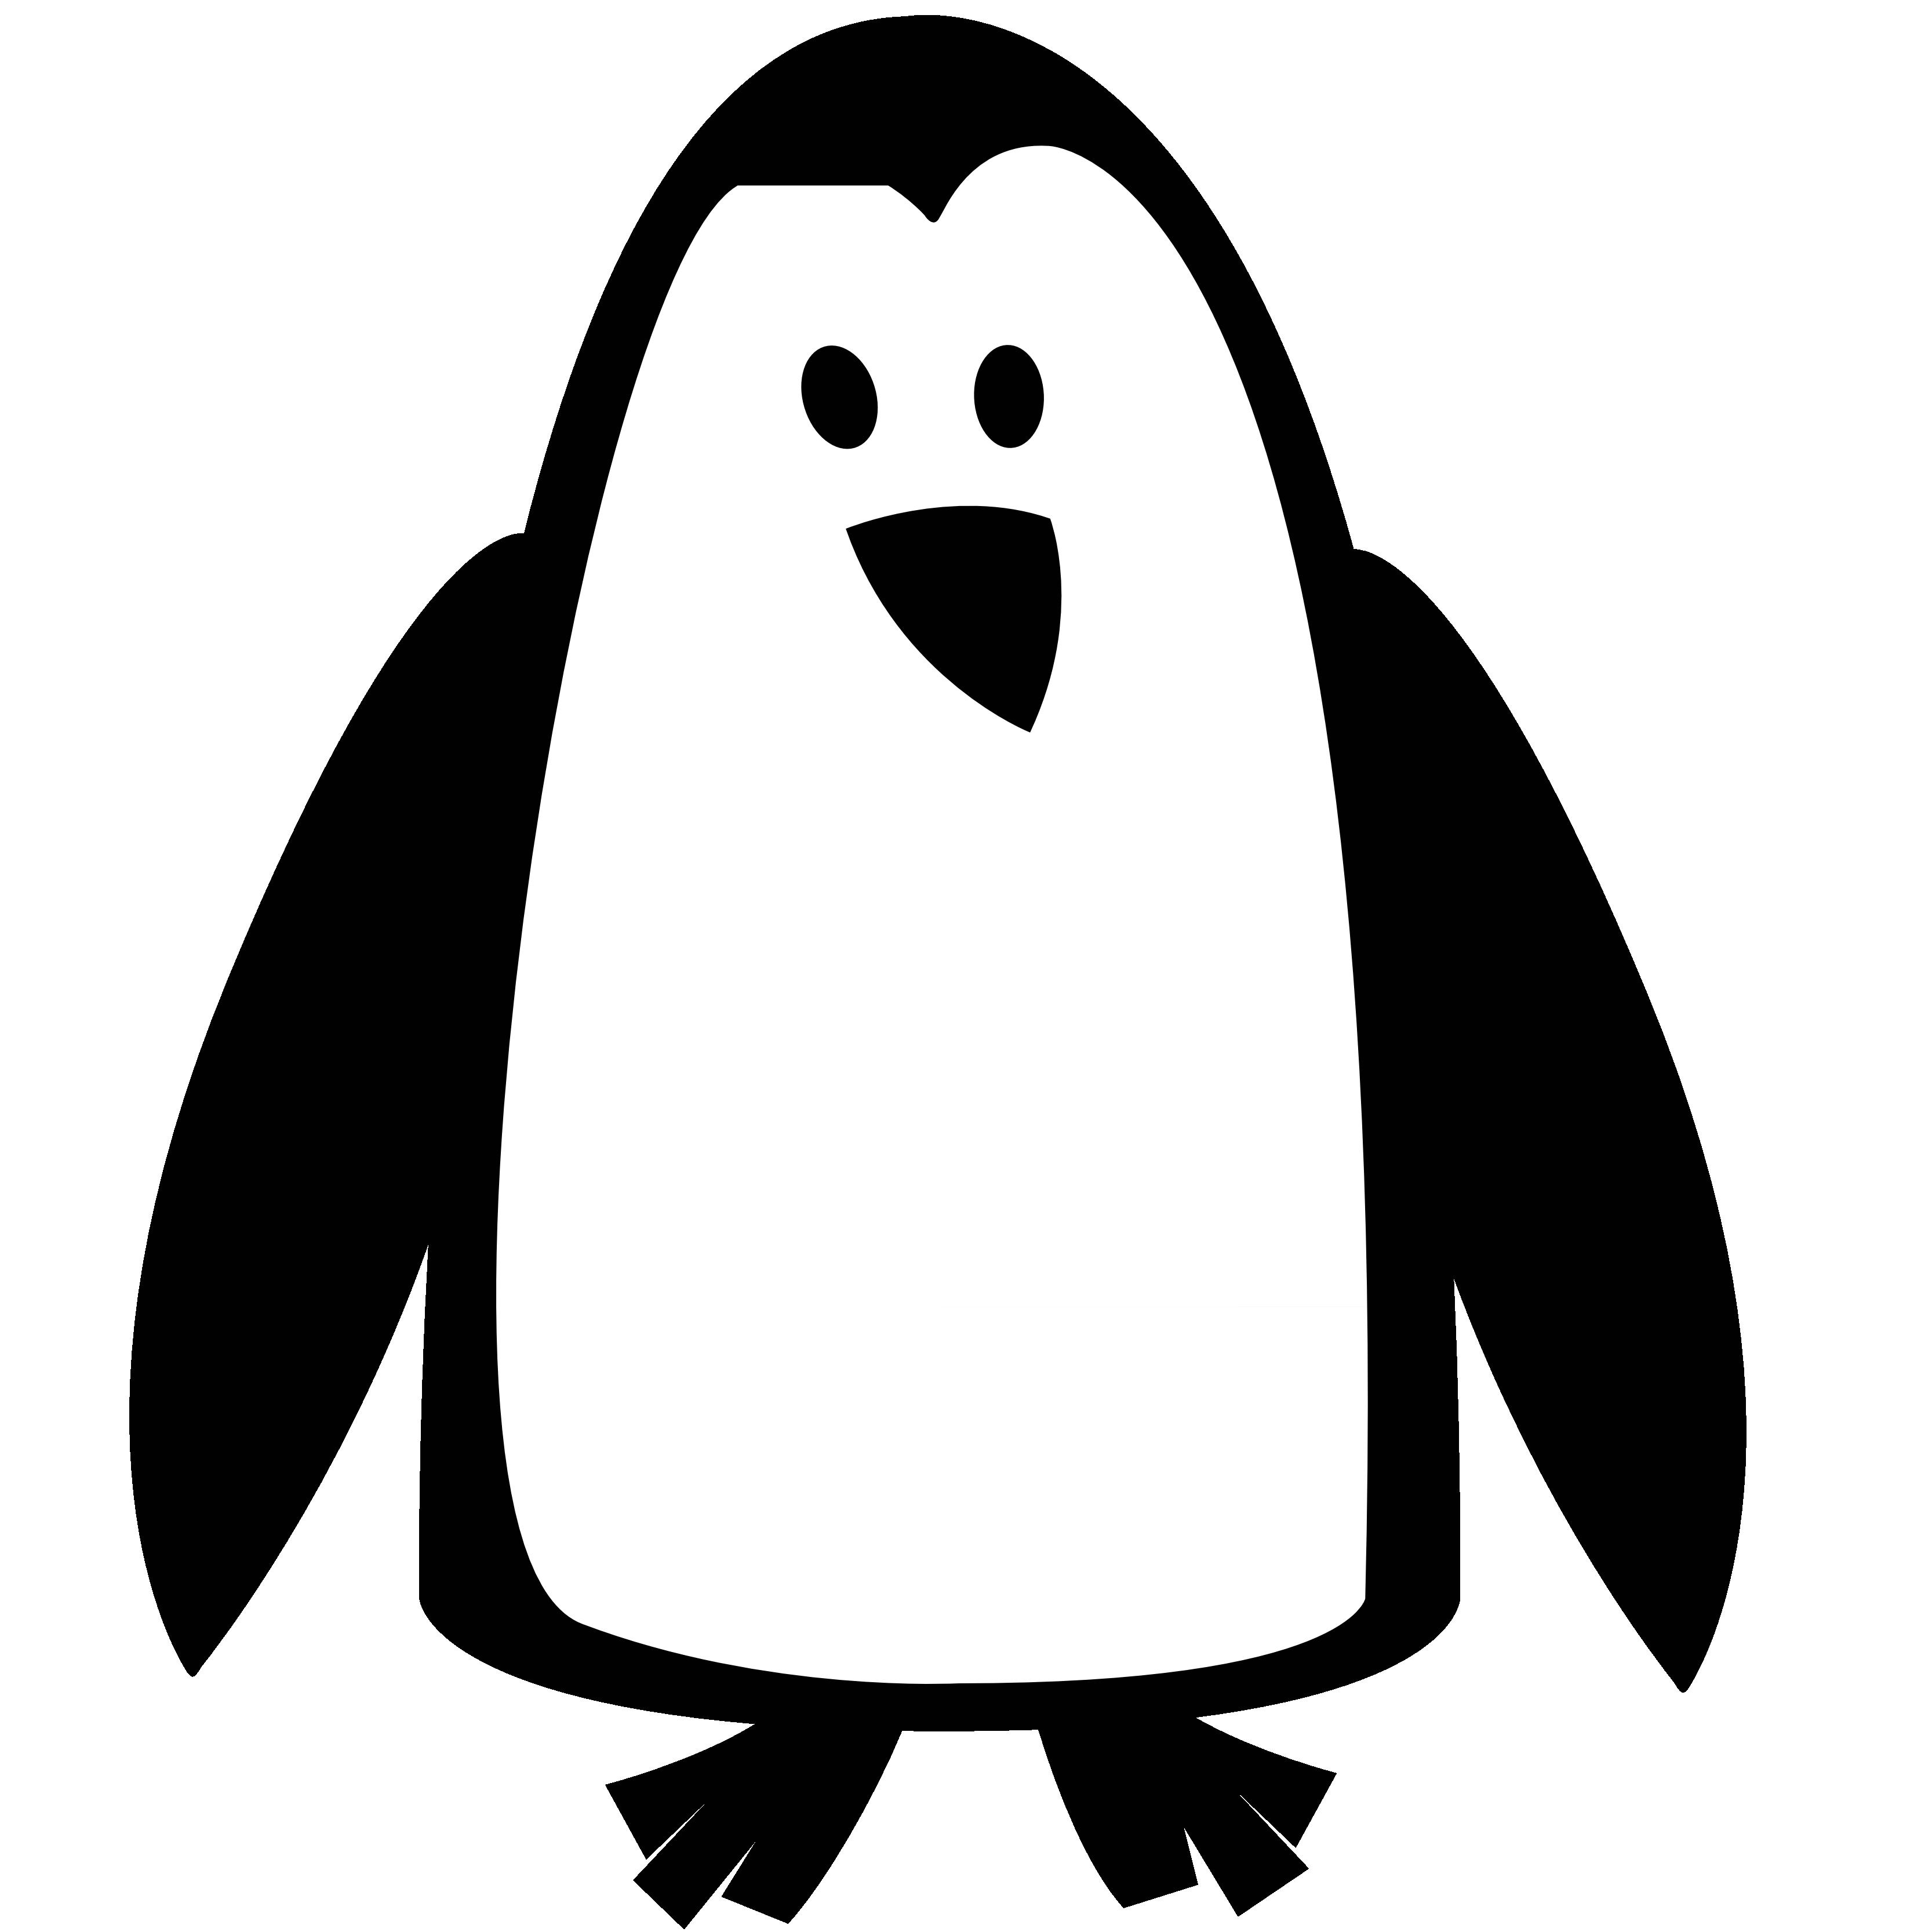 Black And White Google: Penguin Clip Art Black And White - Google Search